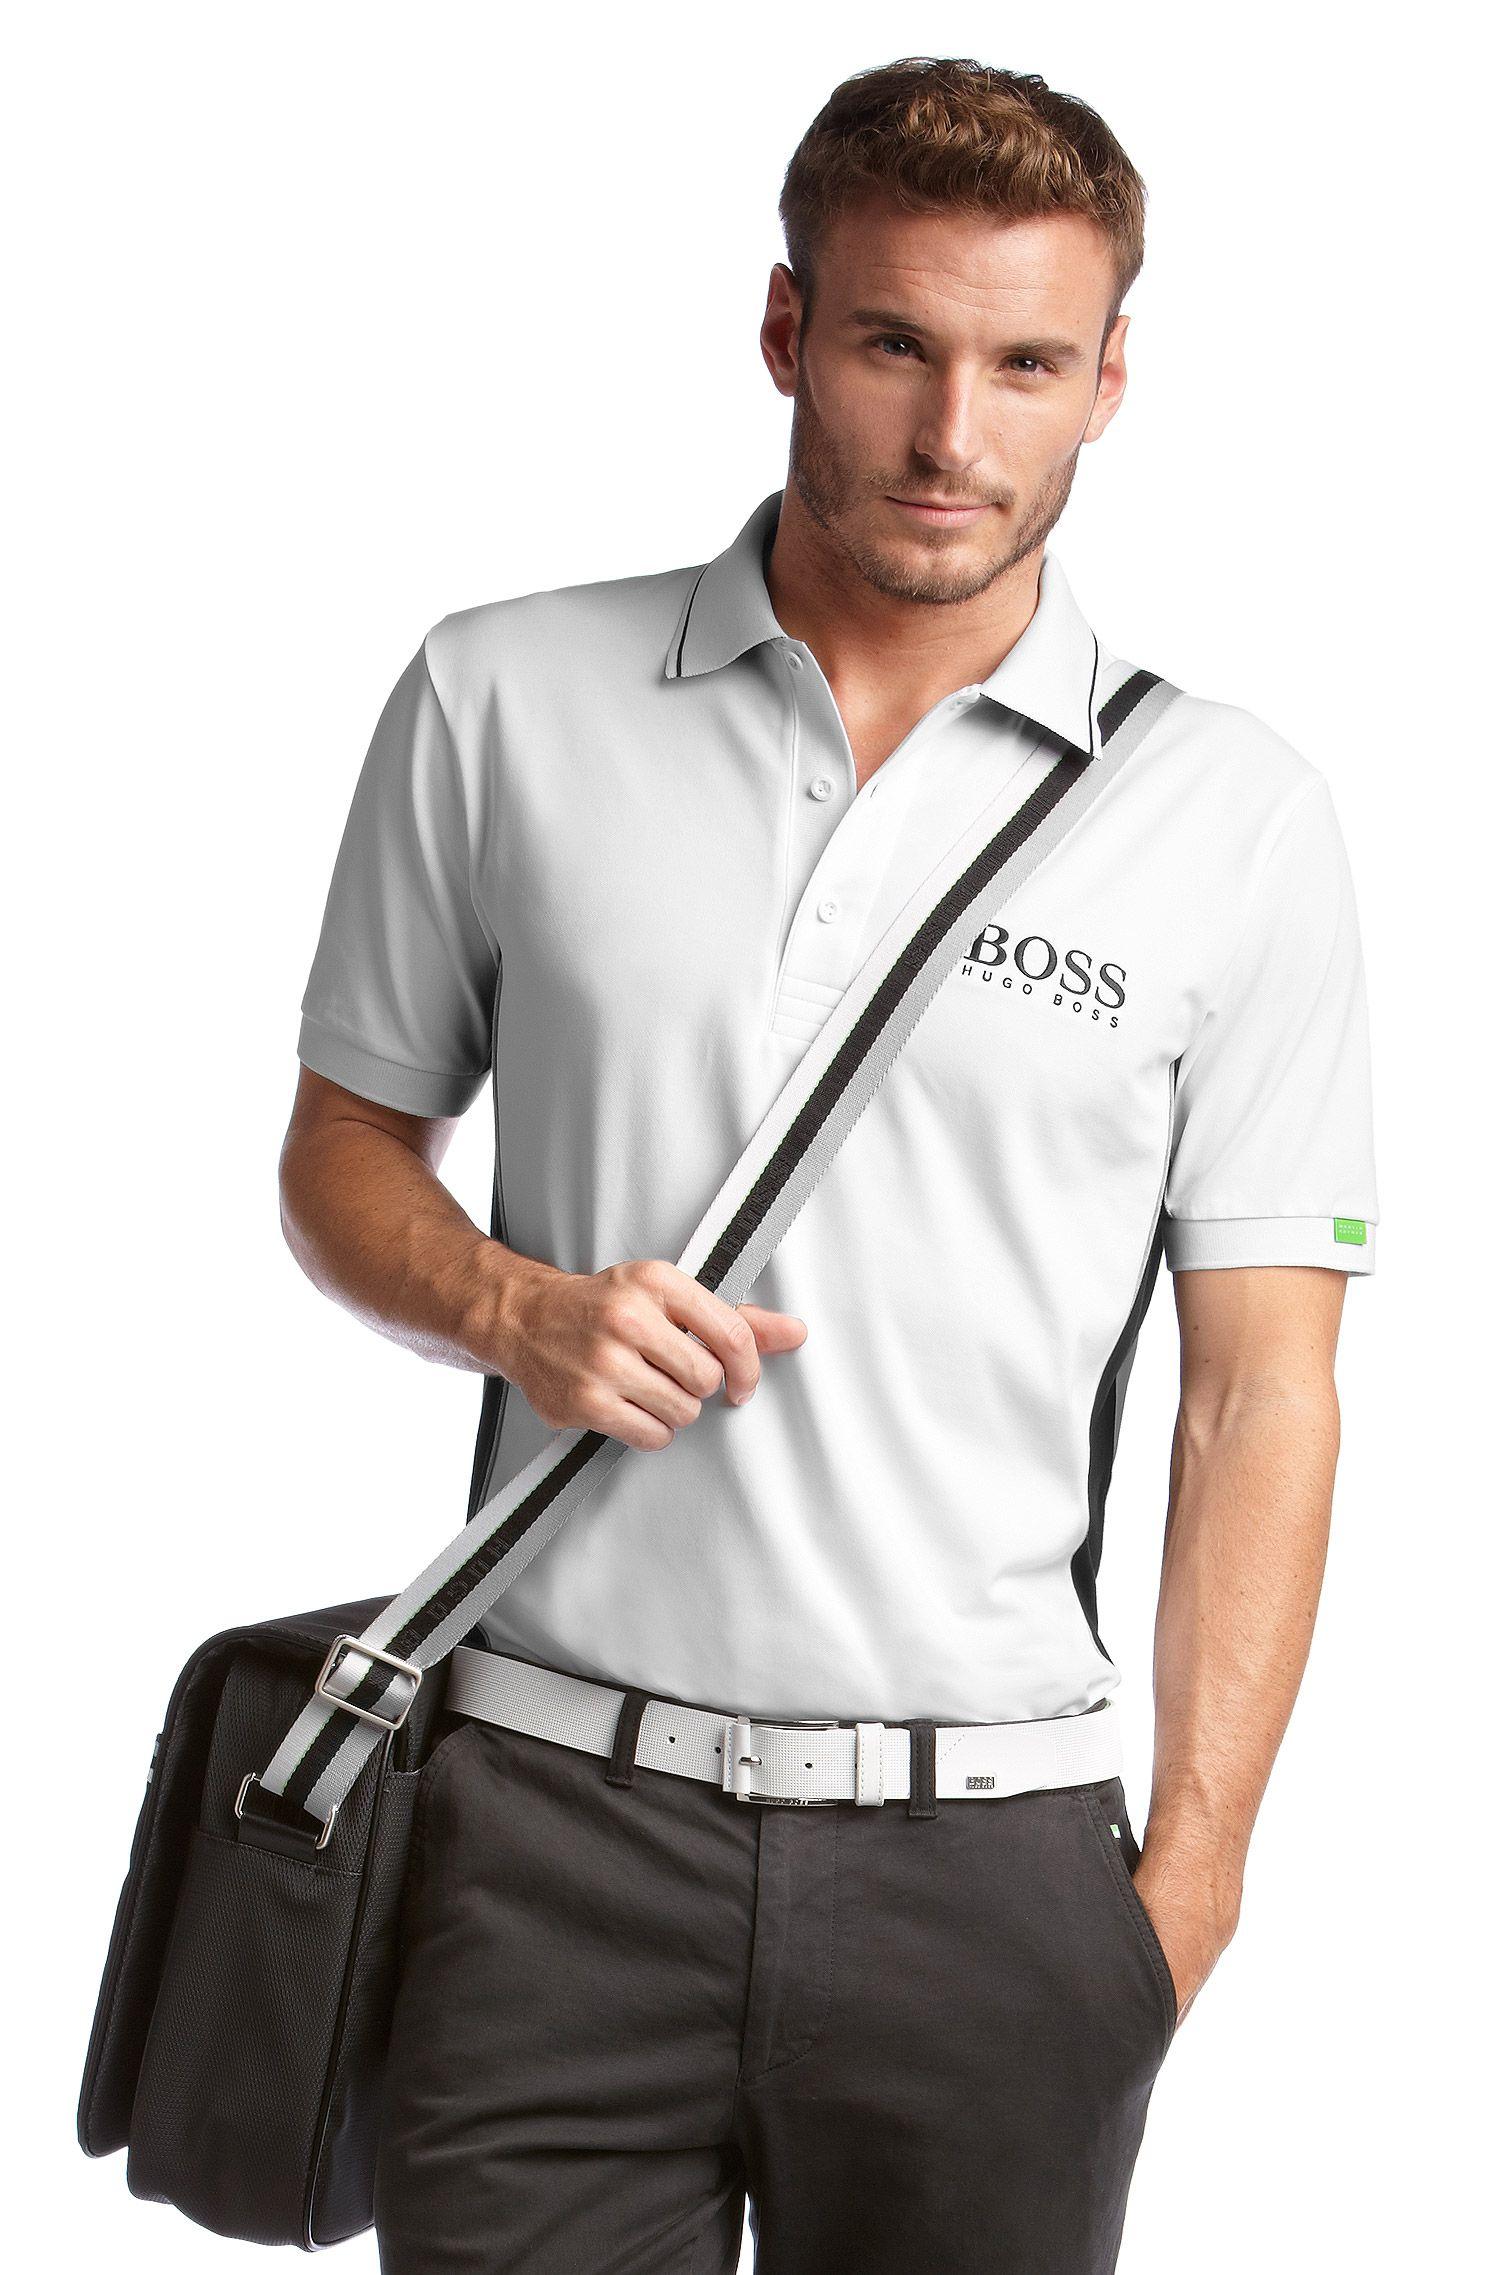 Polo golf en matière fonctionnelle, Paddy MK